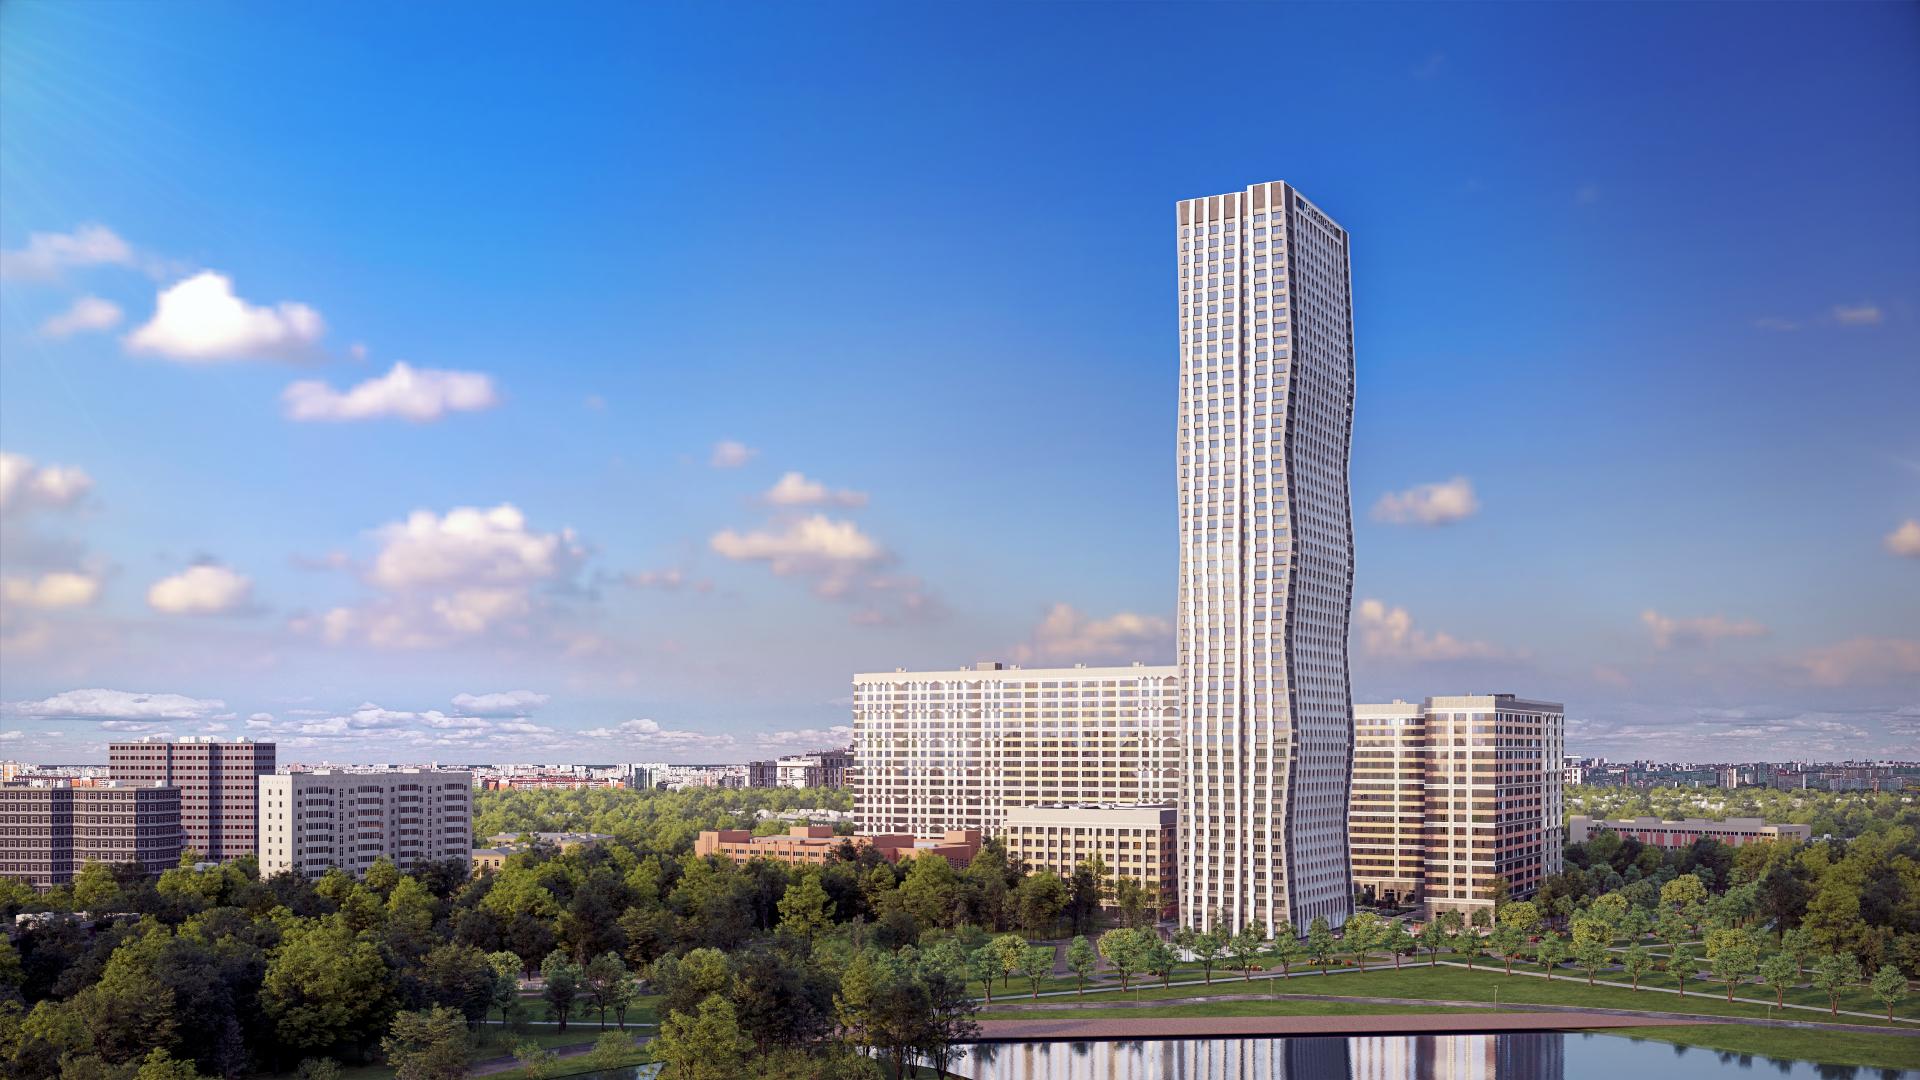 AFI Tower